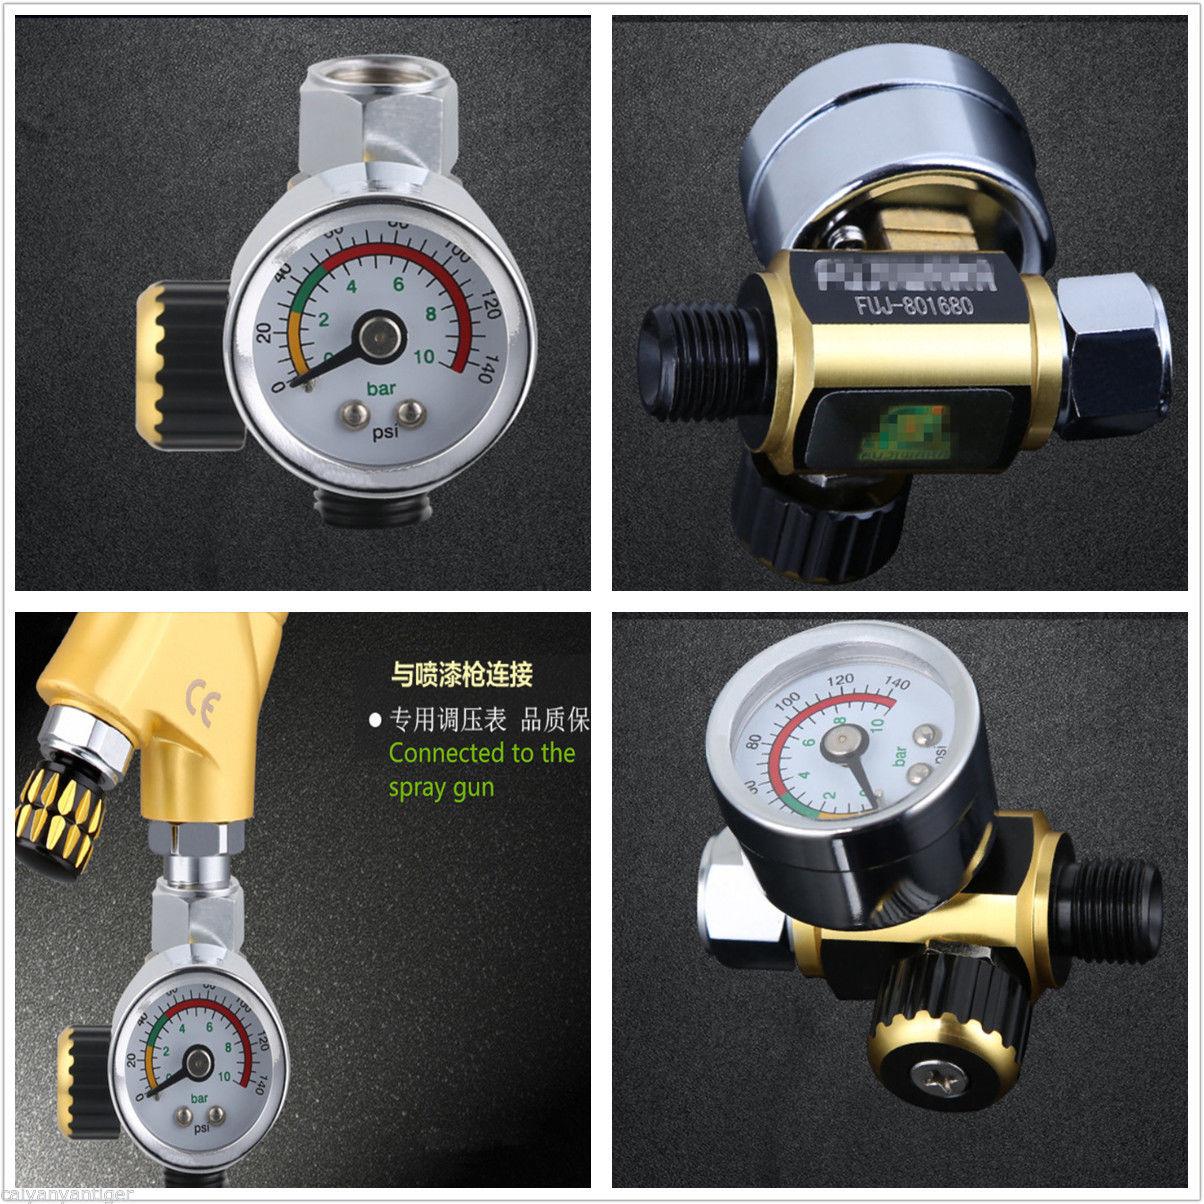 Pistola de pulverización metálica Universal regulador de presión de aire manómetro 0-010mpa G1/4 regulador de presión regulador de alivio ajustable